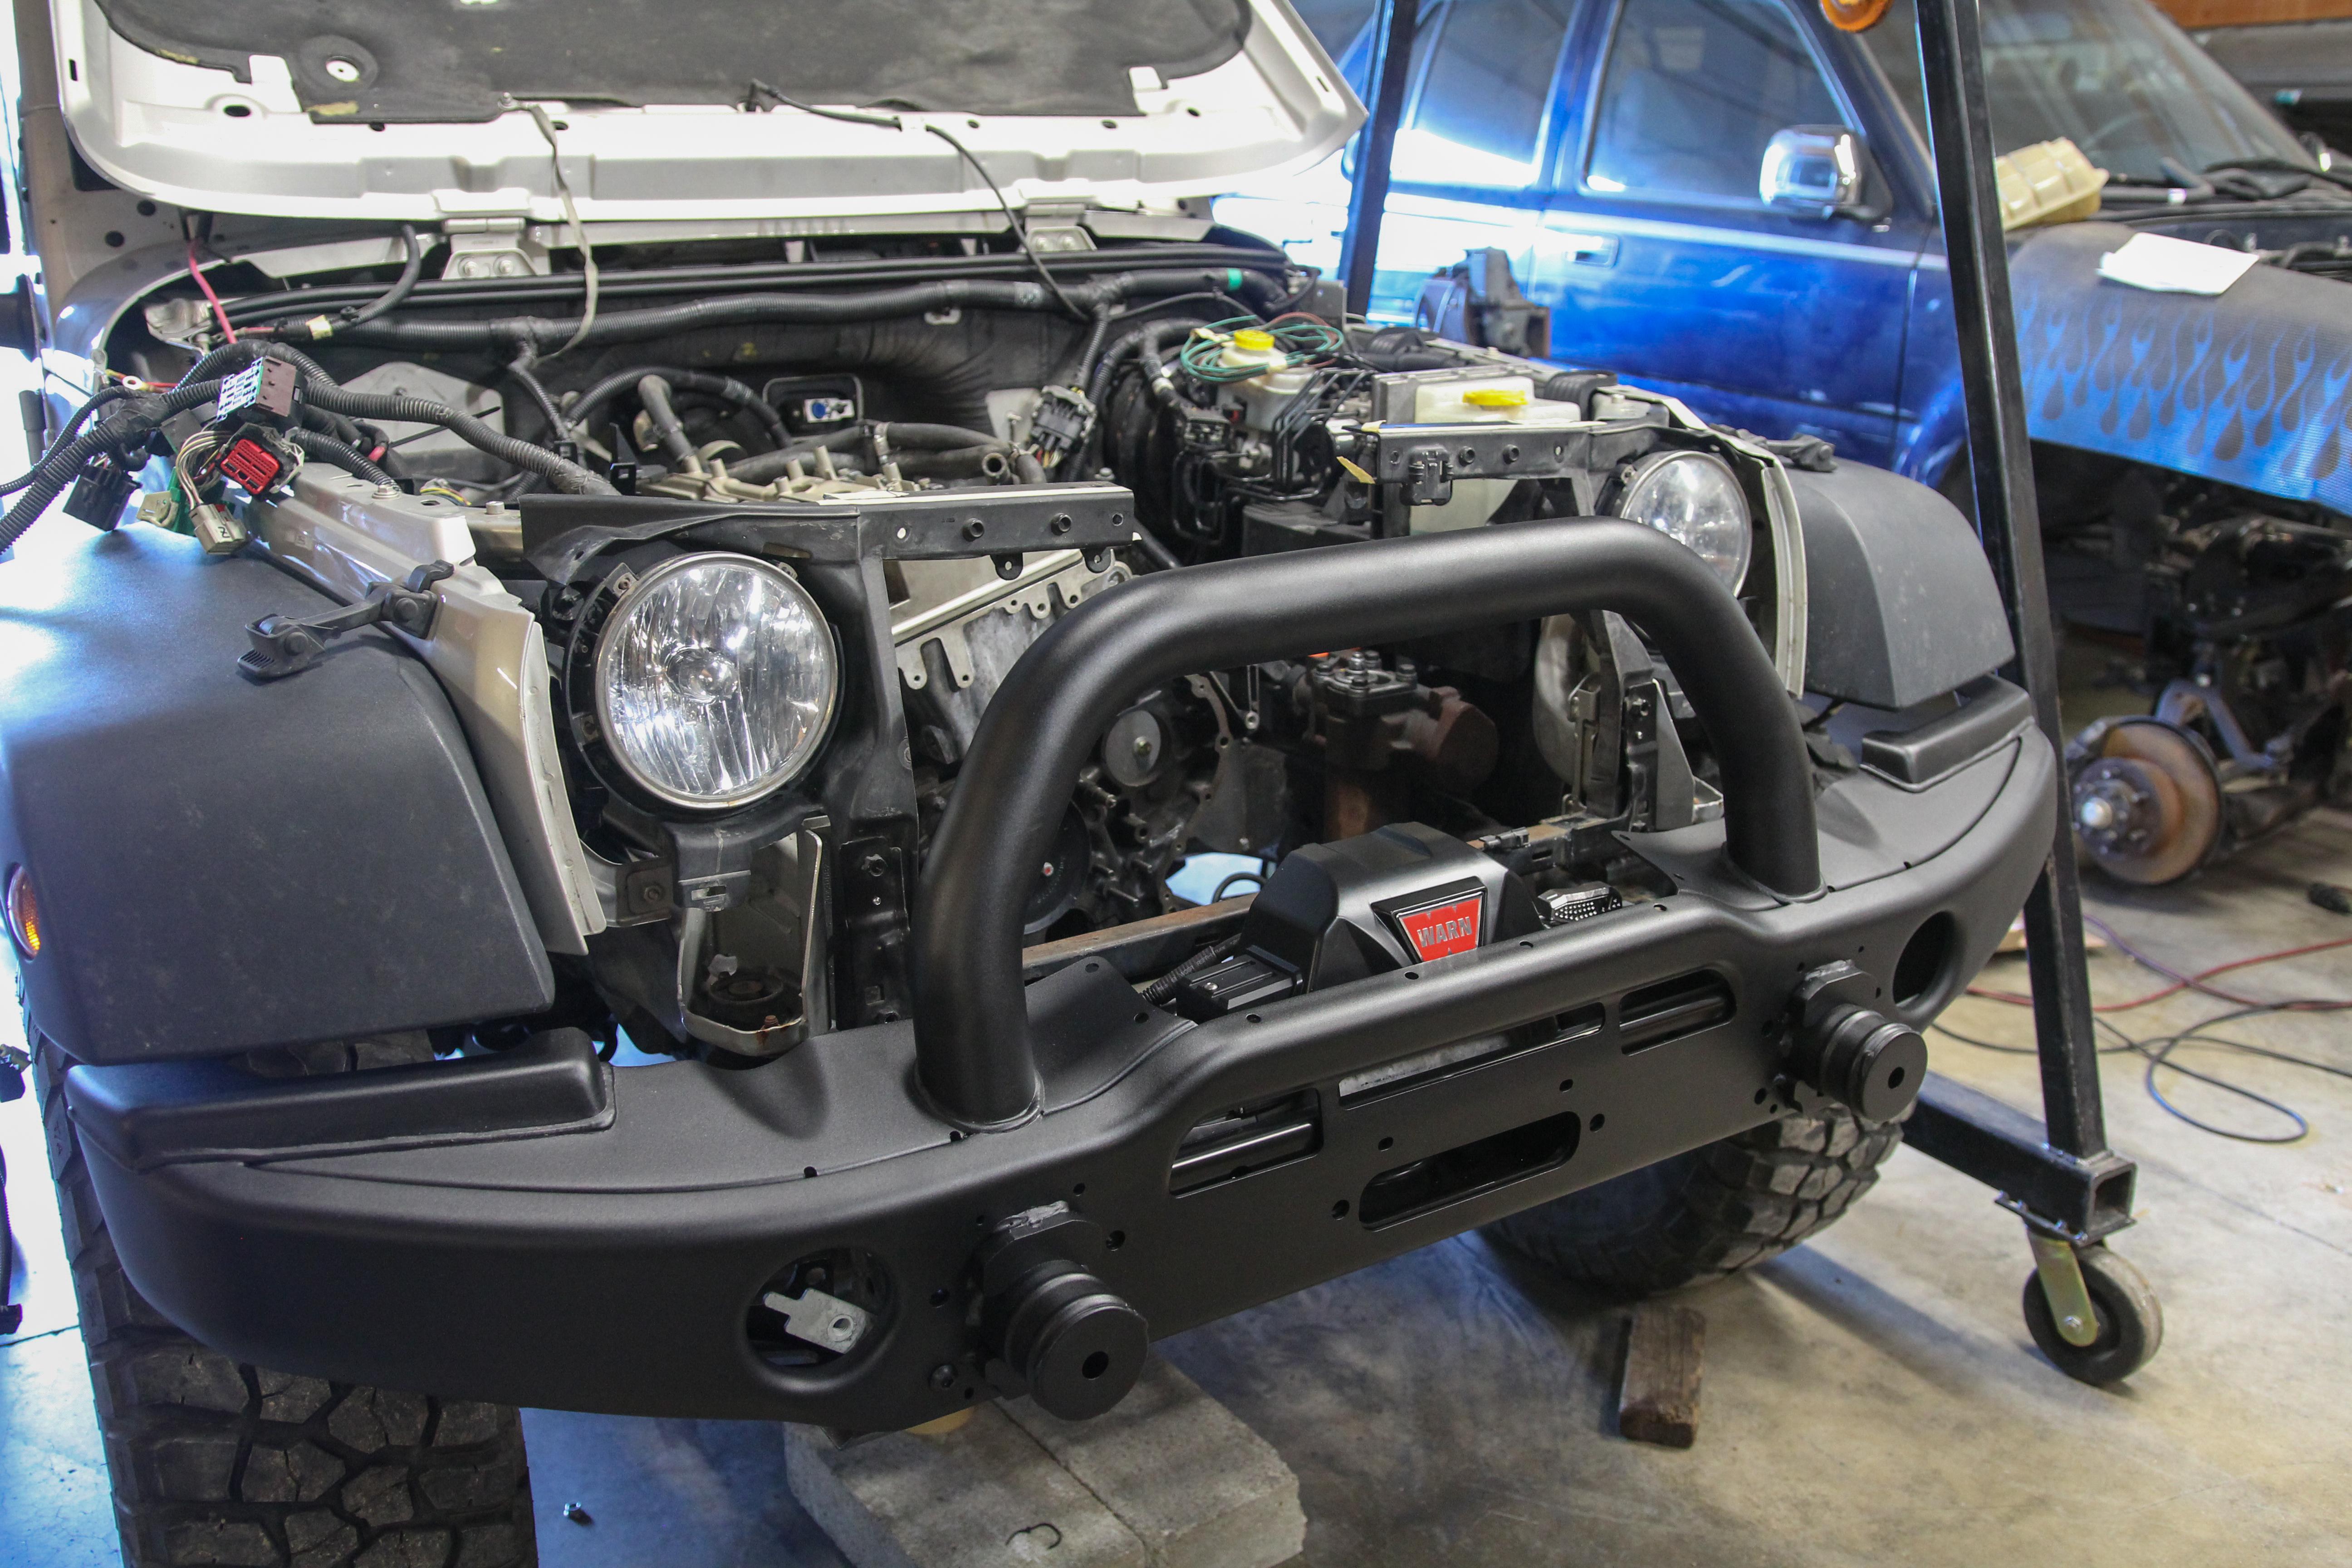 Africa Jeep Jk Wrangler Build Progress 2 Jpfreek Adventure Magazine Pillar Gauge Pod Test Fitting The Warn Zeon 10 S And Aev Front Bumper